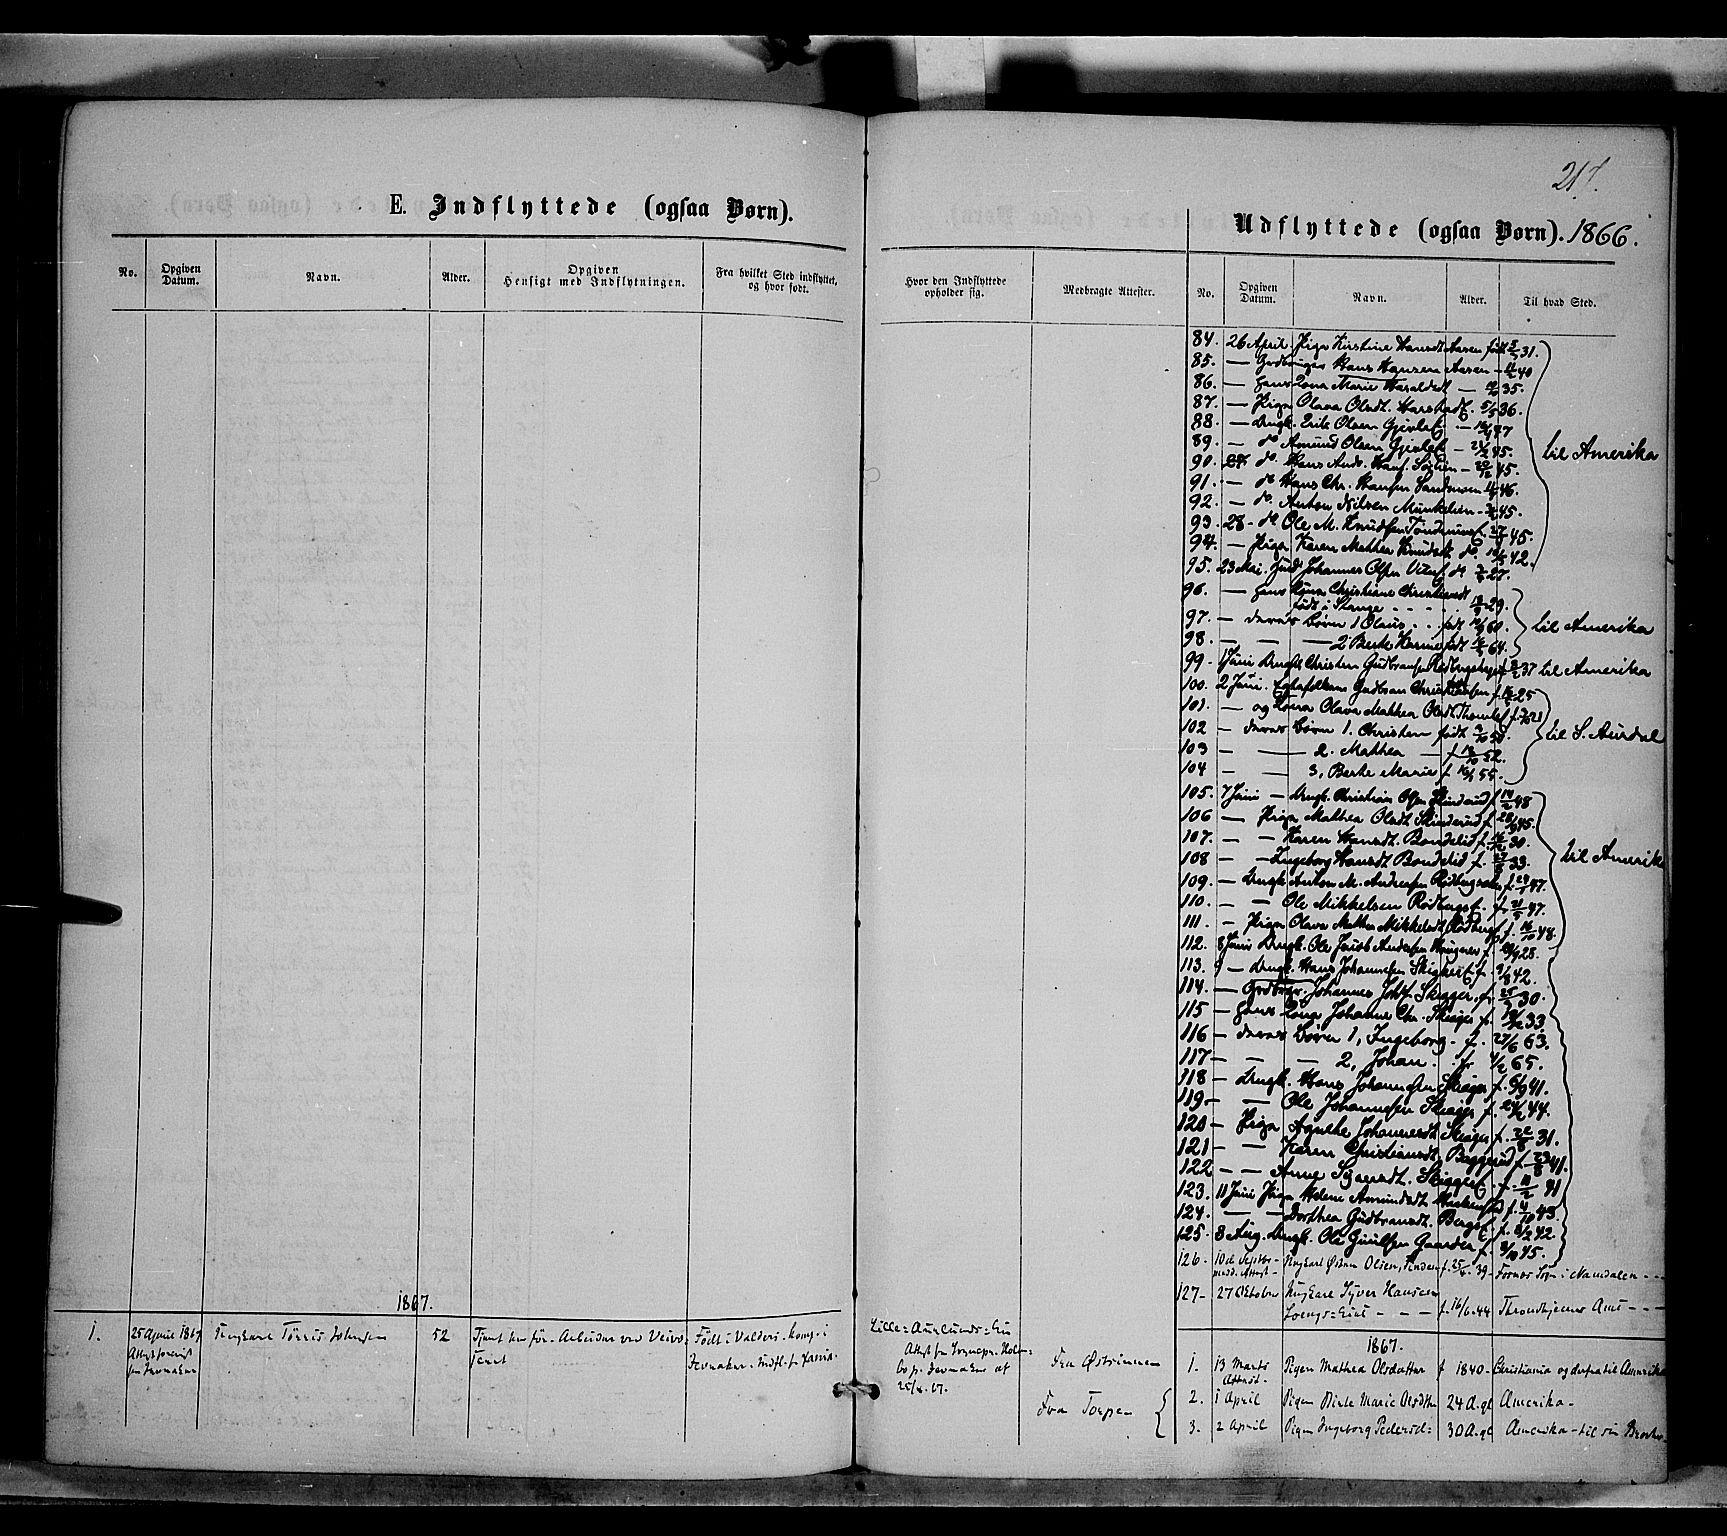 SAH, Nordre Land prestekontor, Ministerialbok nr. 1, 1860-1871, s. 217